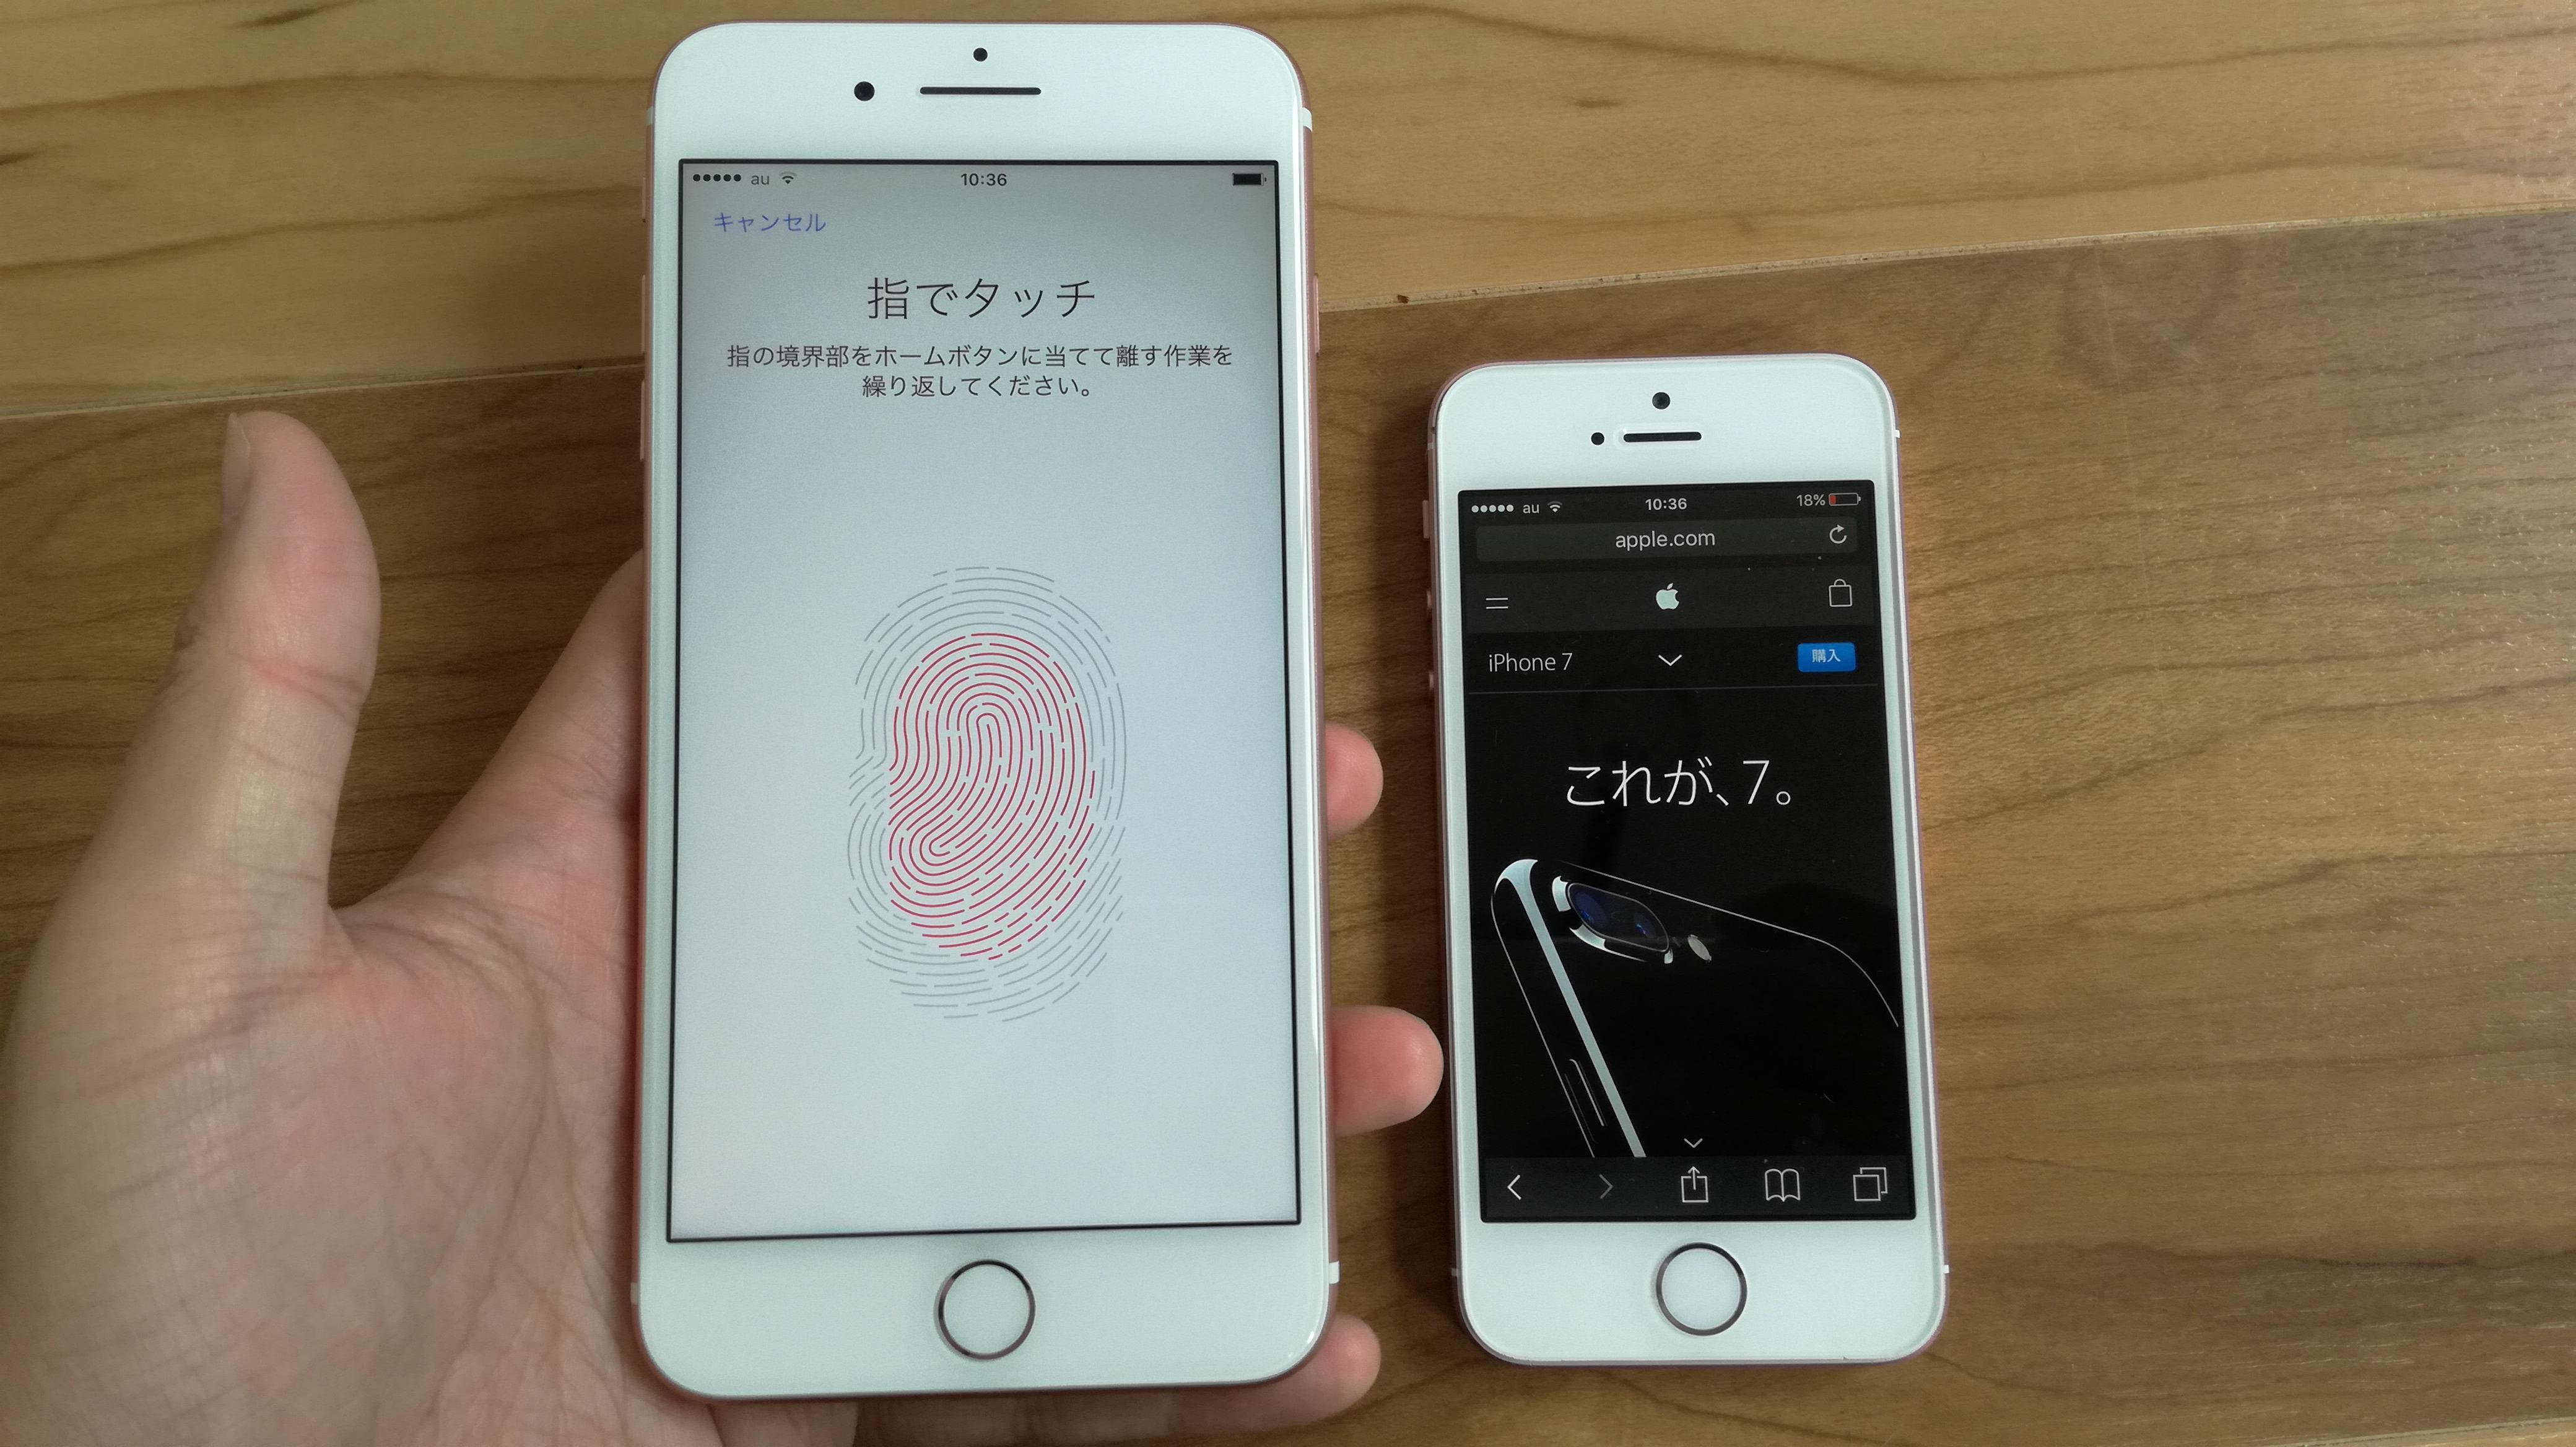 Wifi設定、apple IDの作成